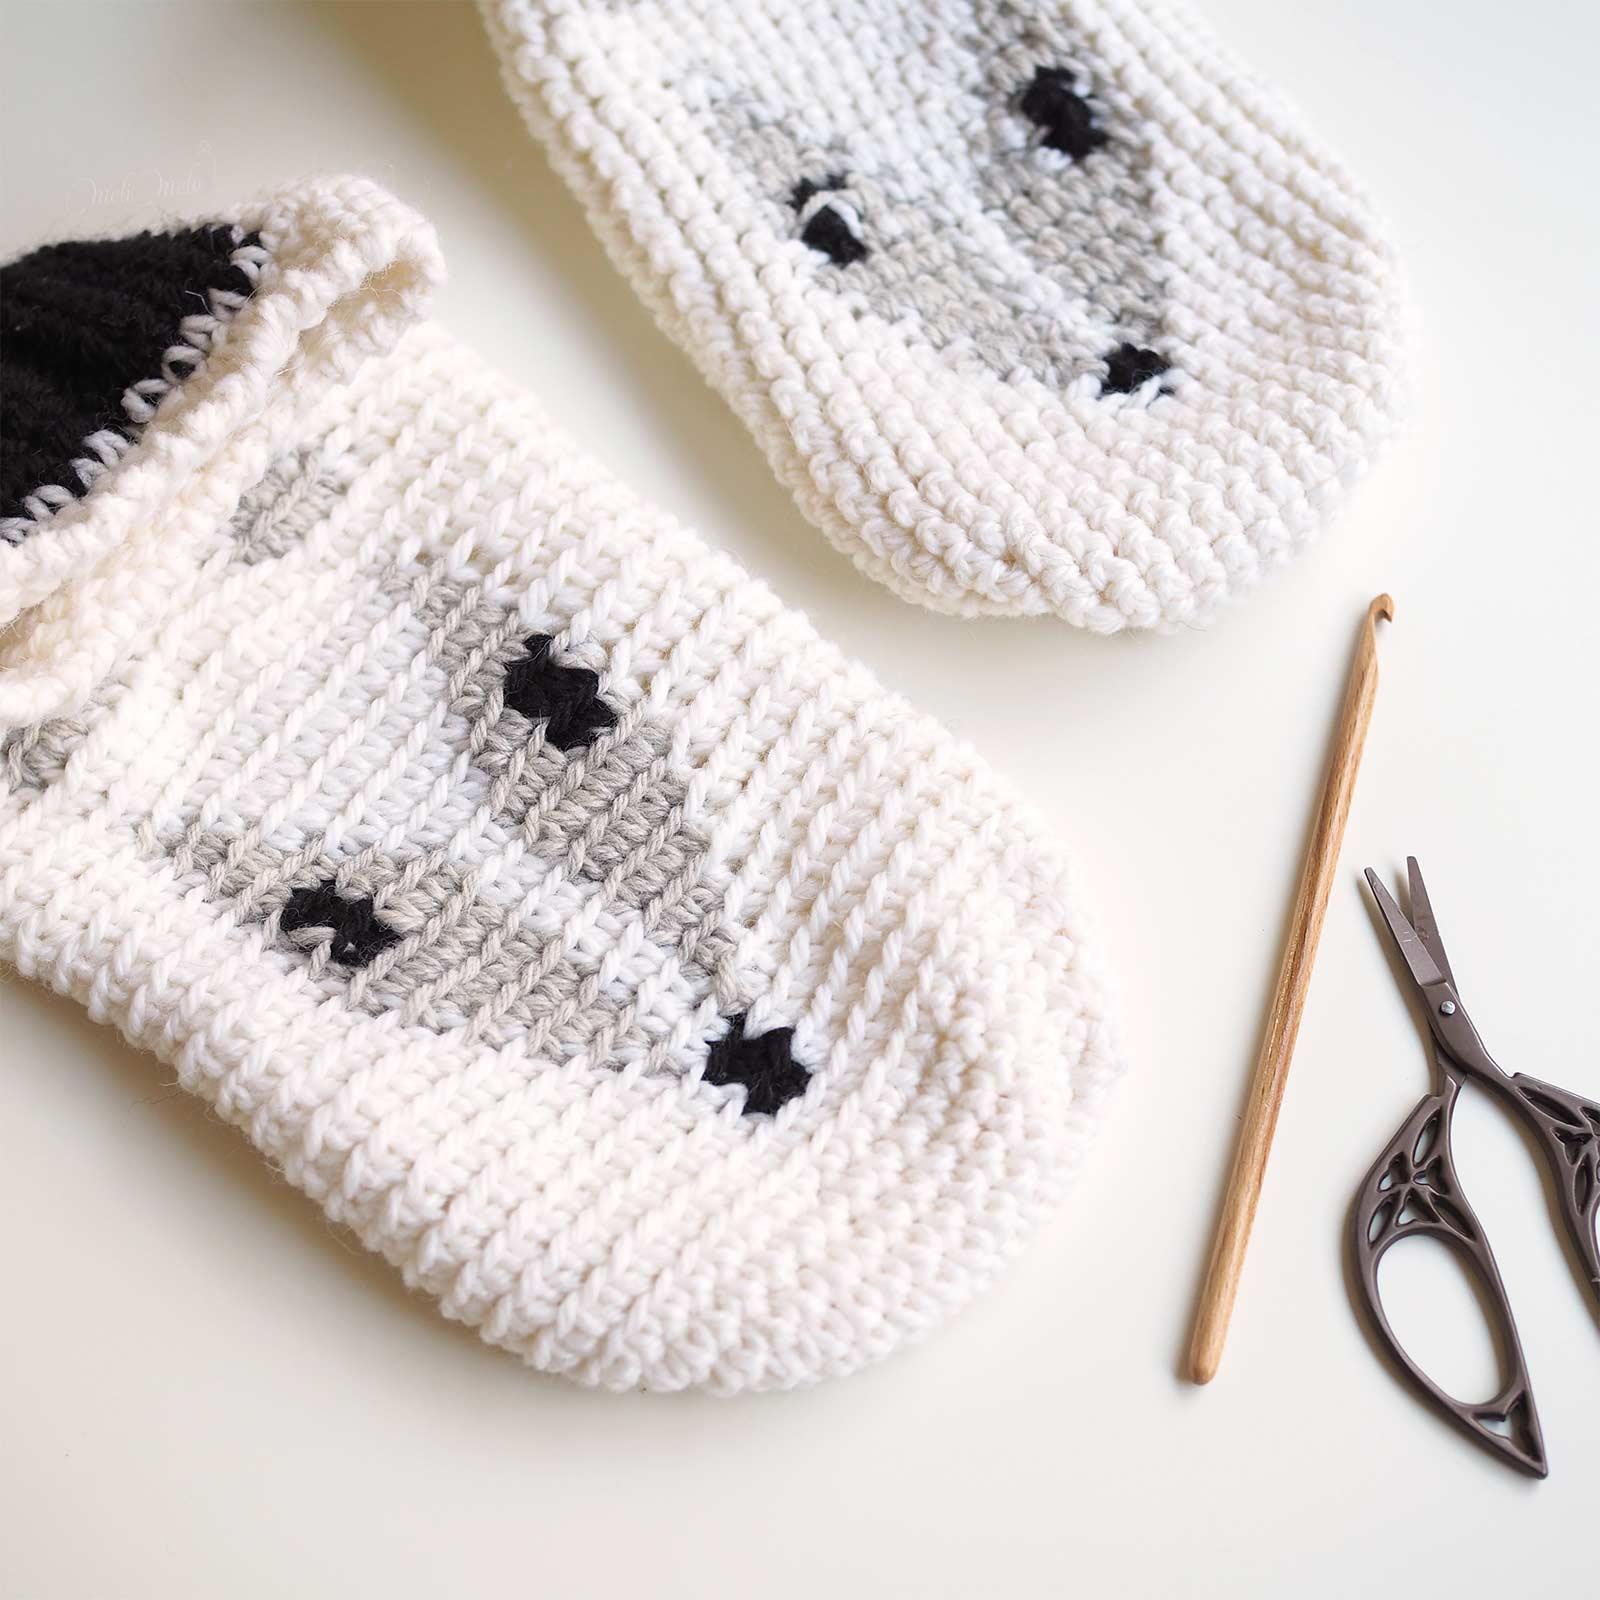 crochet chaussons loup slippers wolf boutique melimelo devine debris